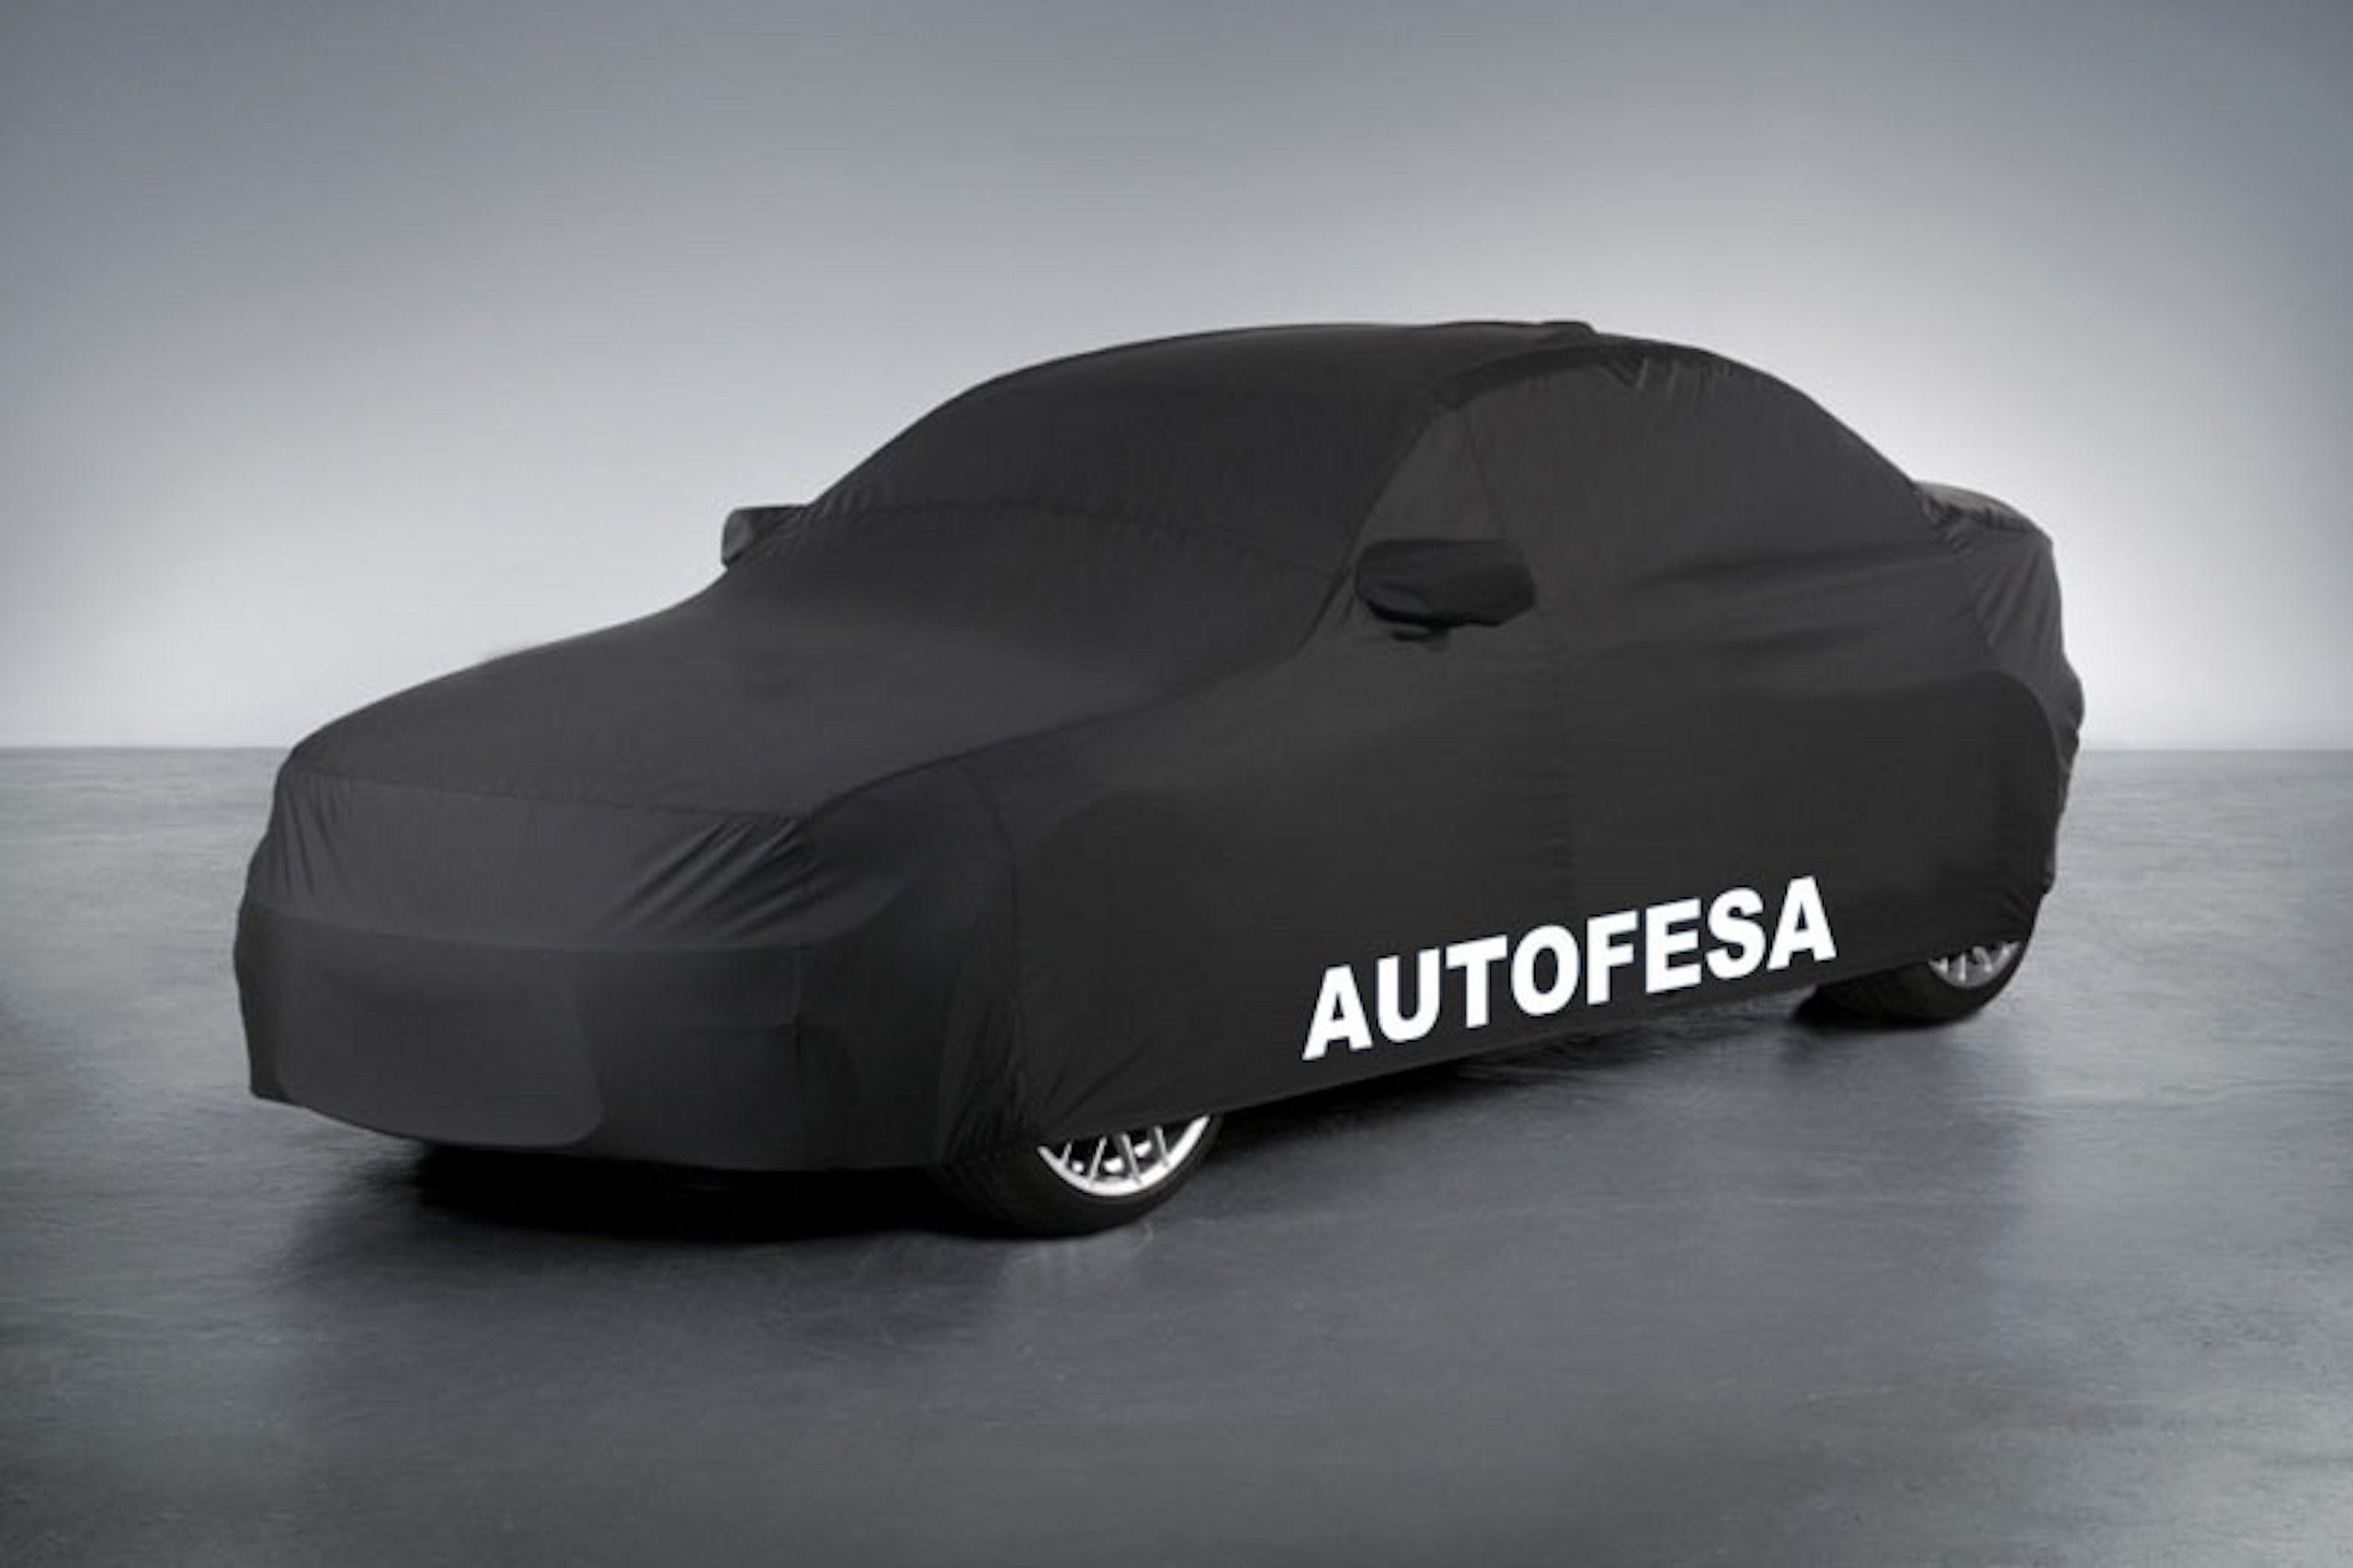 Audi Q5 2.0 TDI 170cv quattro 5p S tronic Auto - Foto 6